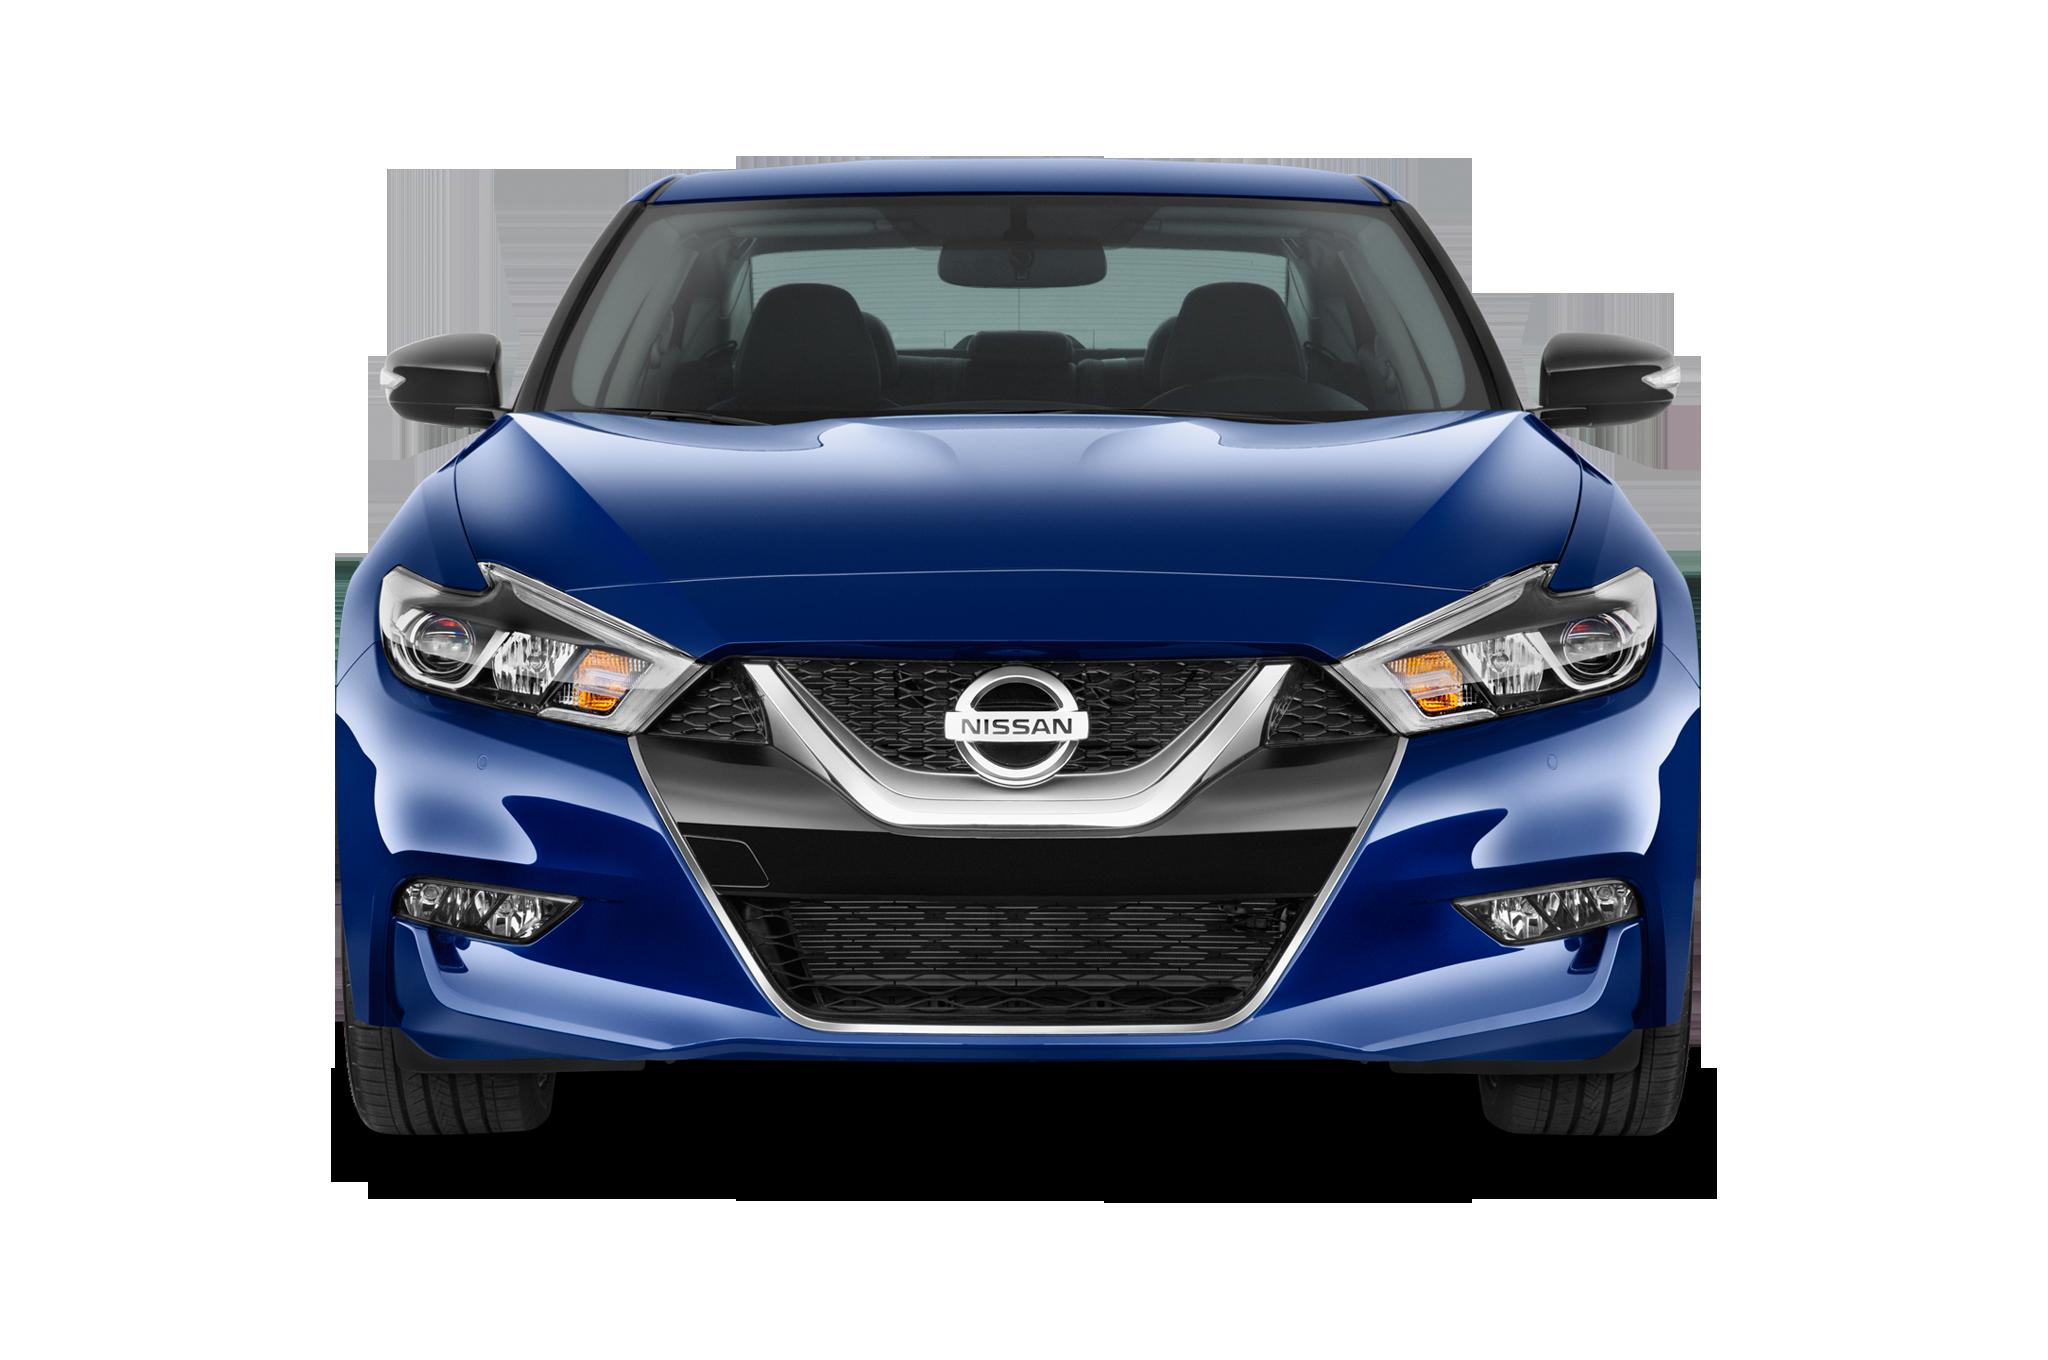 2017 Nissan Maxima Reviews.